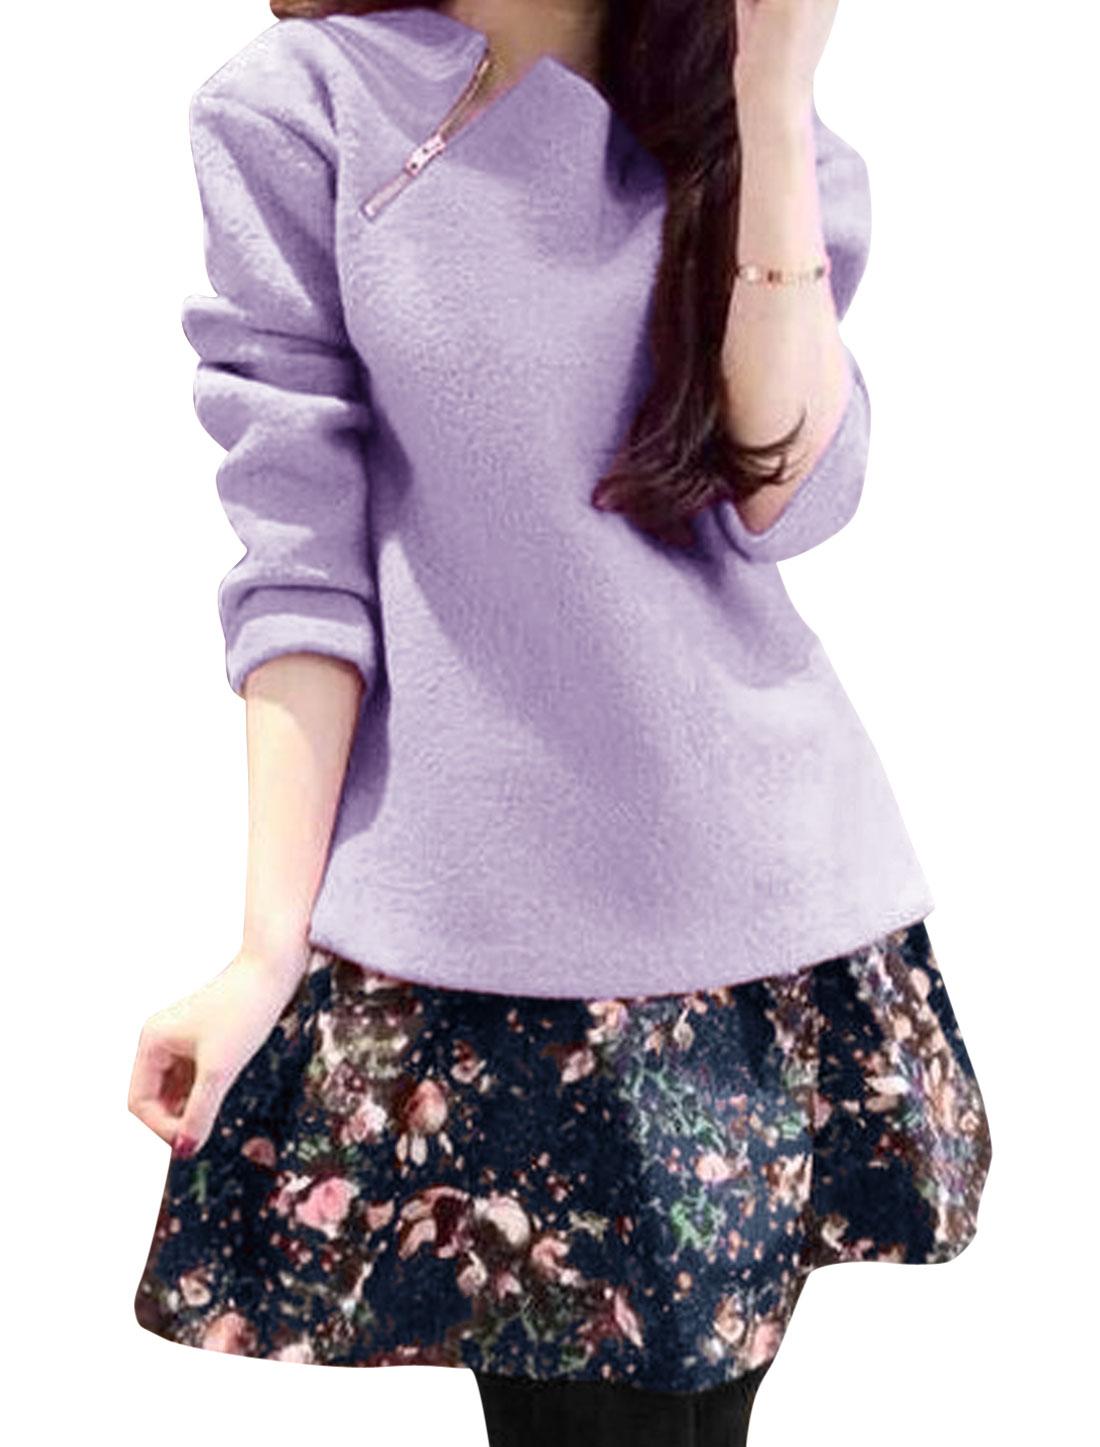 Lady Purple Zipper Side Top w Navy Blue Floral Prints Elastic Skirt Set XS